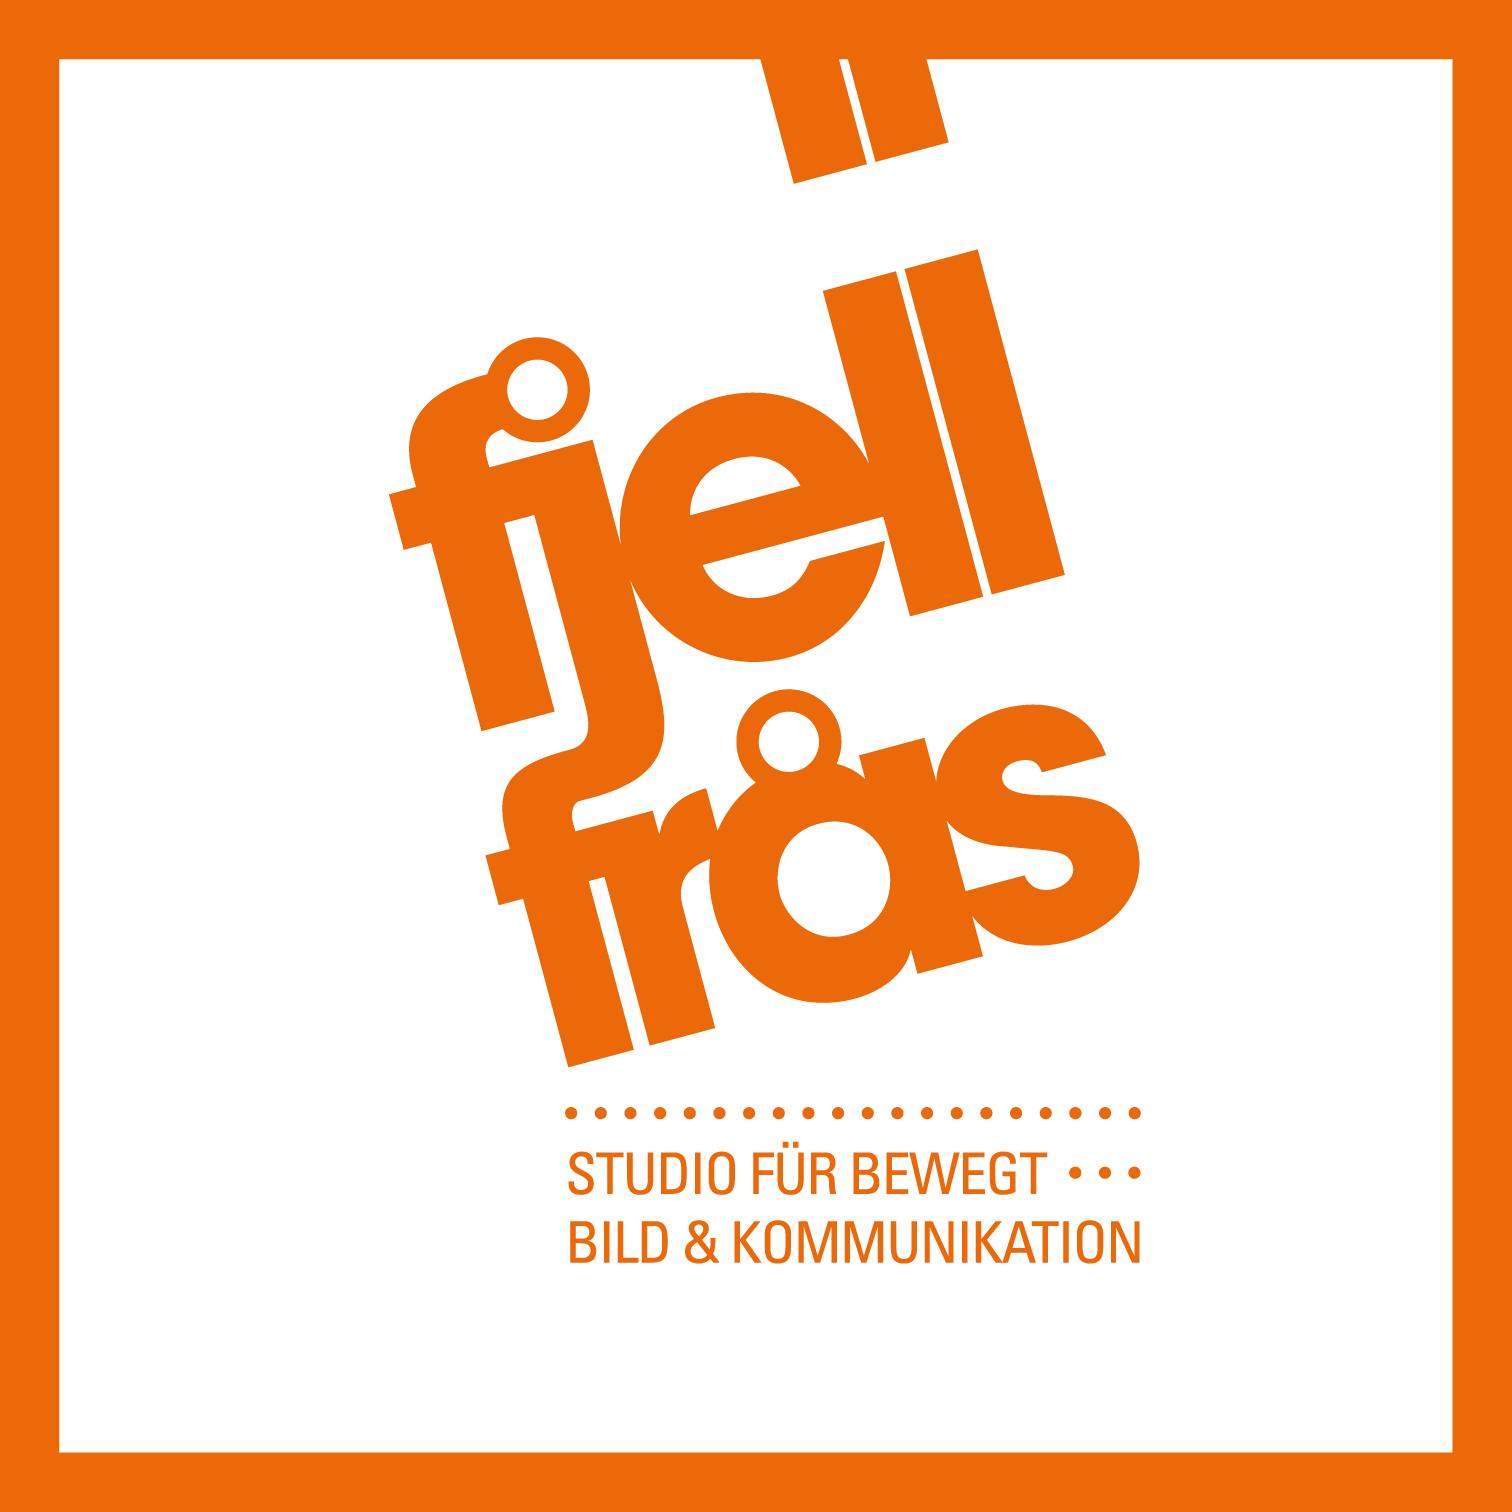 fjellfras • Studio für Bewegtbild & Kommunikation